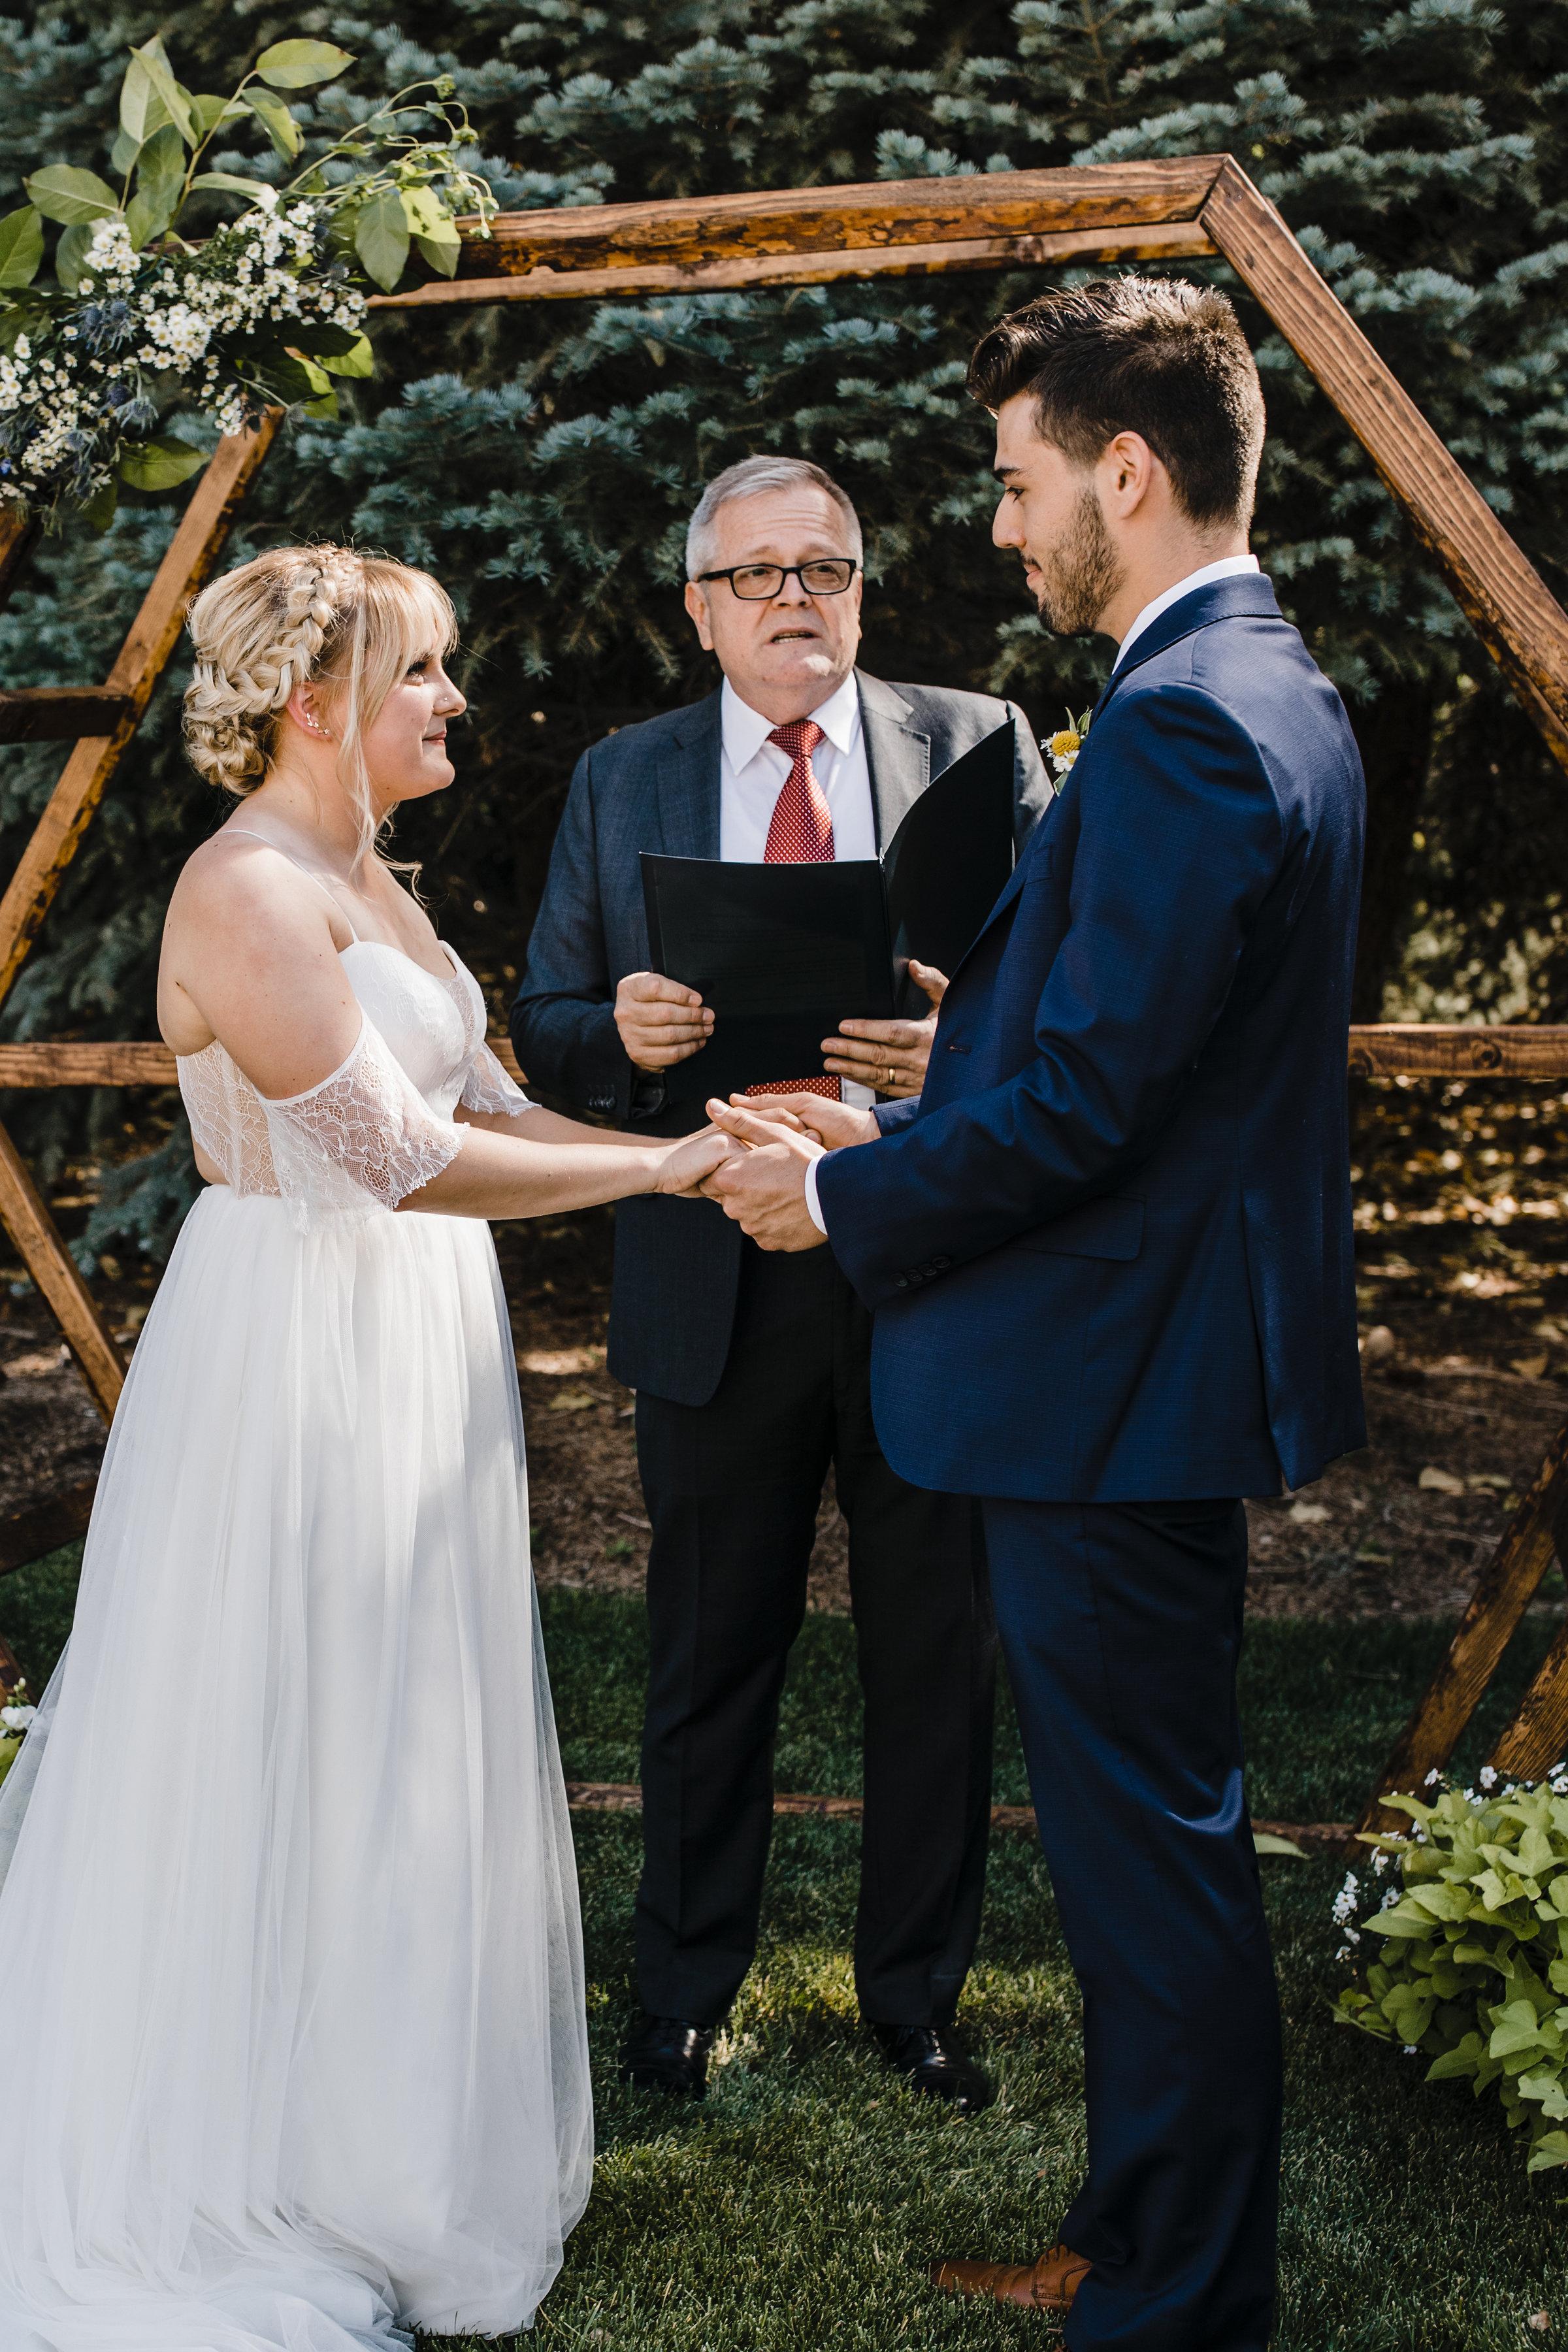 Salt Lake City Utah Professional Photographer bohemian outdoor wedding geometric wedding arch vows holding hands braids